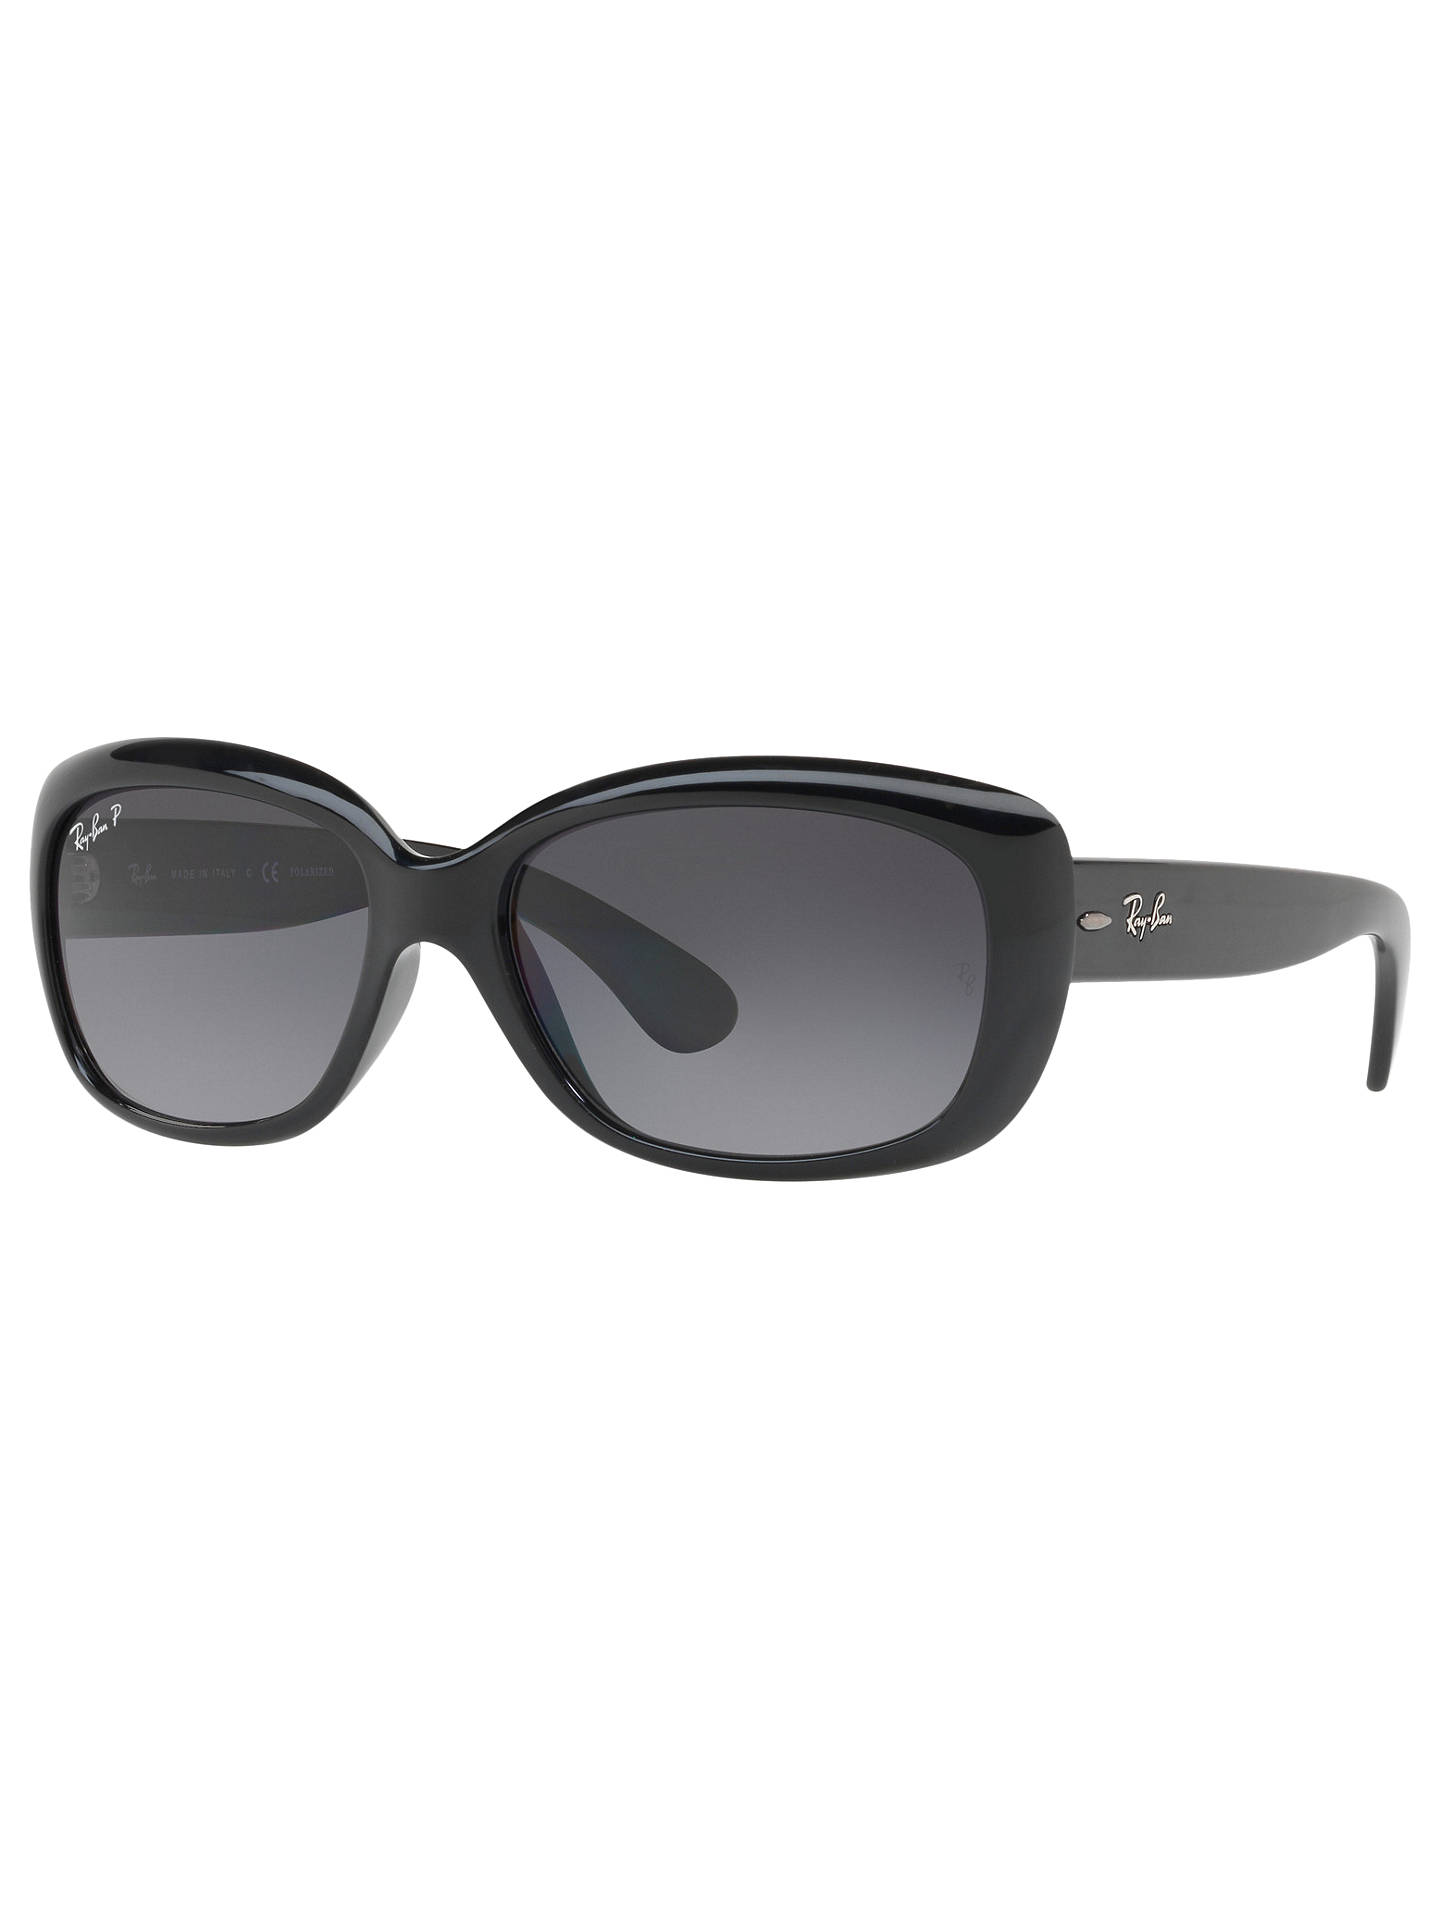 697cb918696c Ray-Ban RB4101 Polarised Jackie Ohh Rectangular Sunglasses at John ...